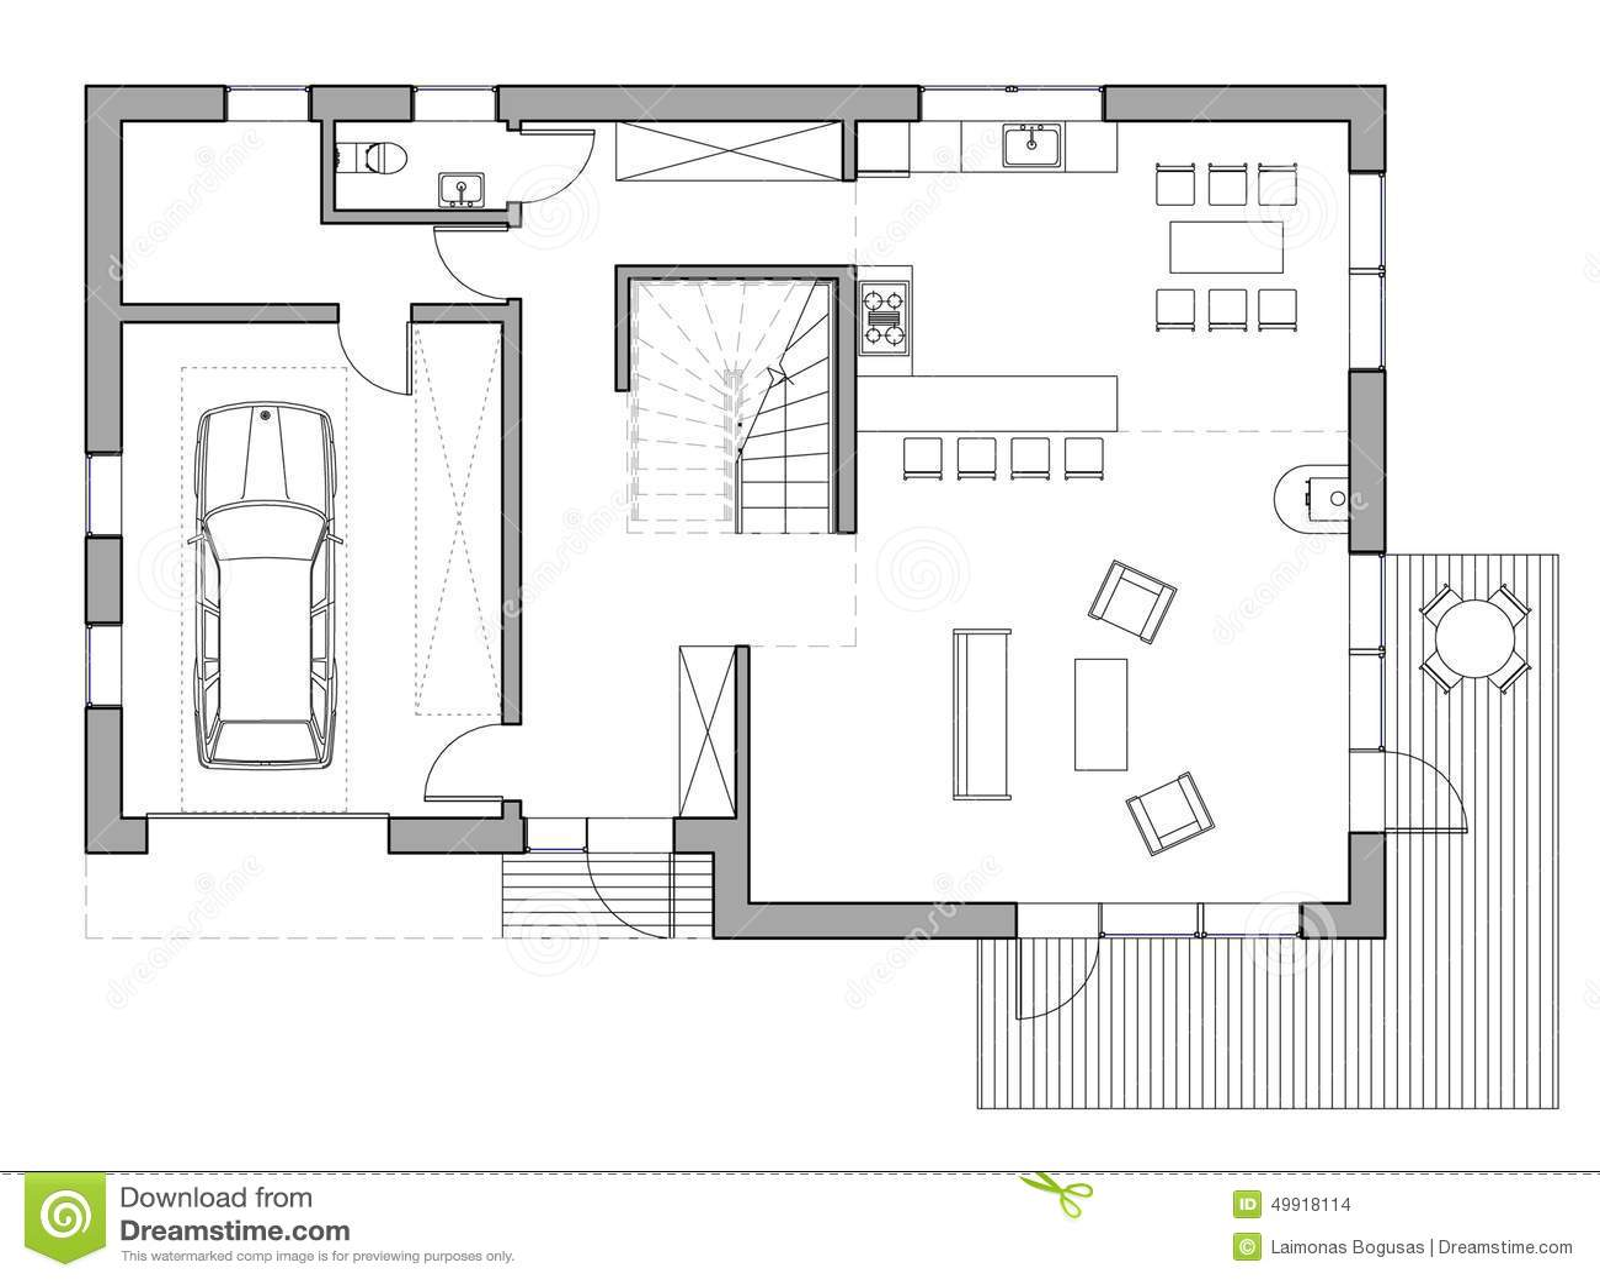 drawing single family house stock illustration On disegno pianta casa